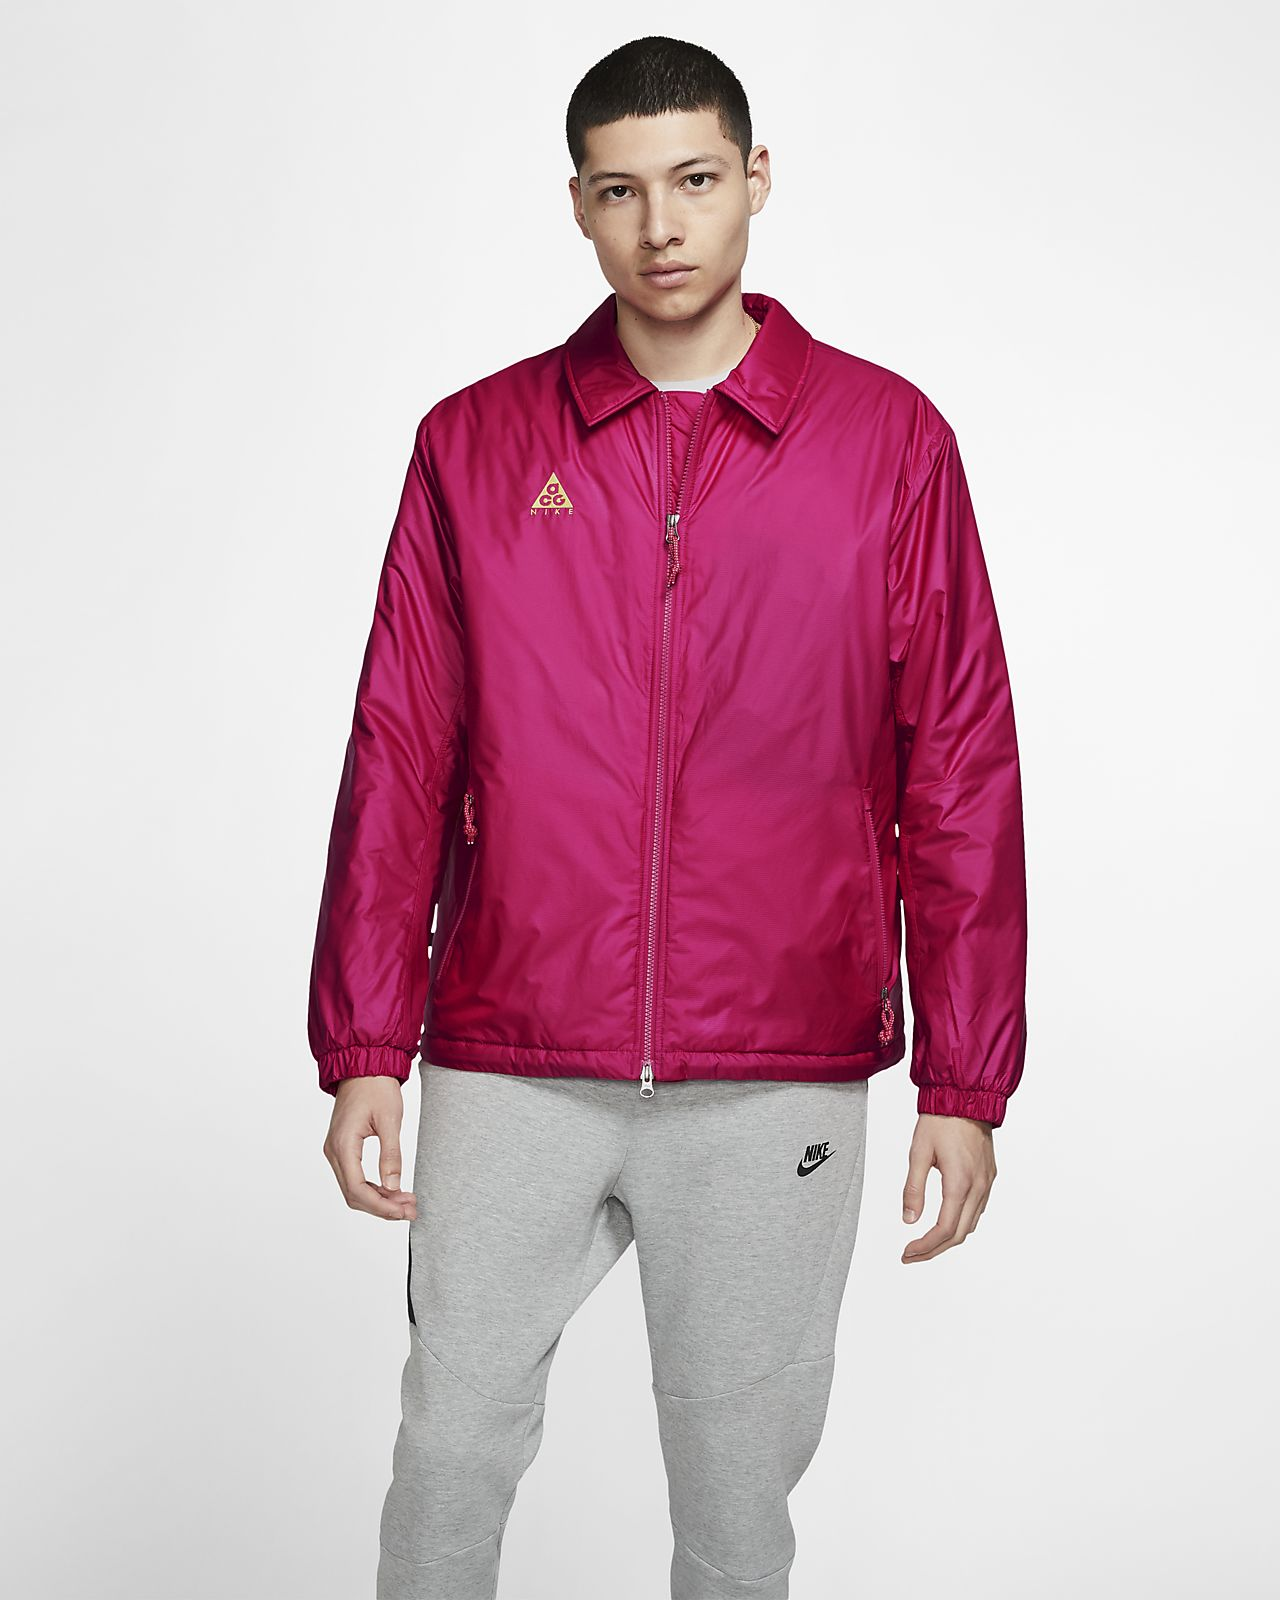 Nike ACG PrimaLoft® herrejakke